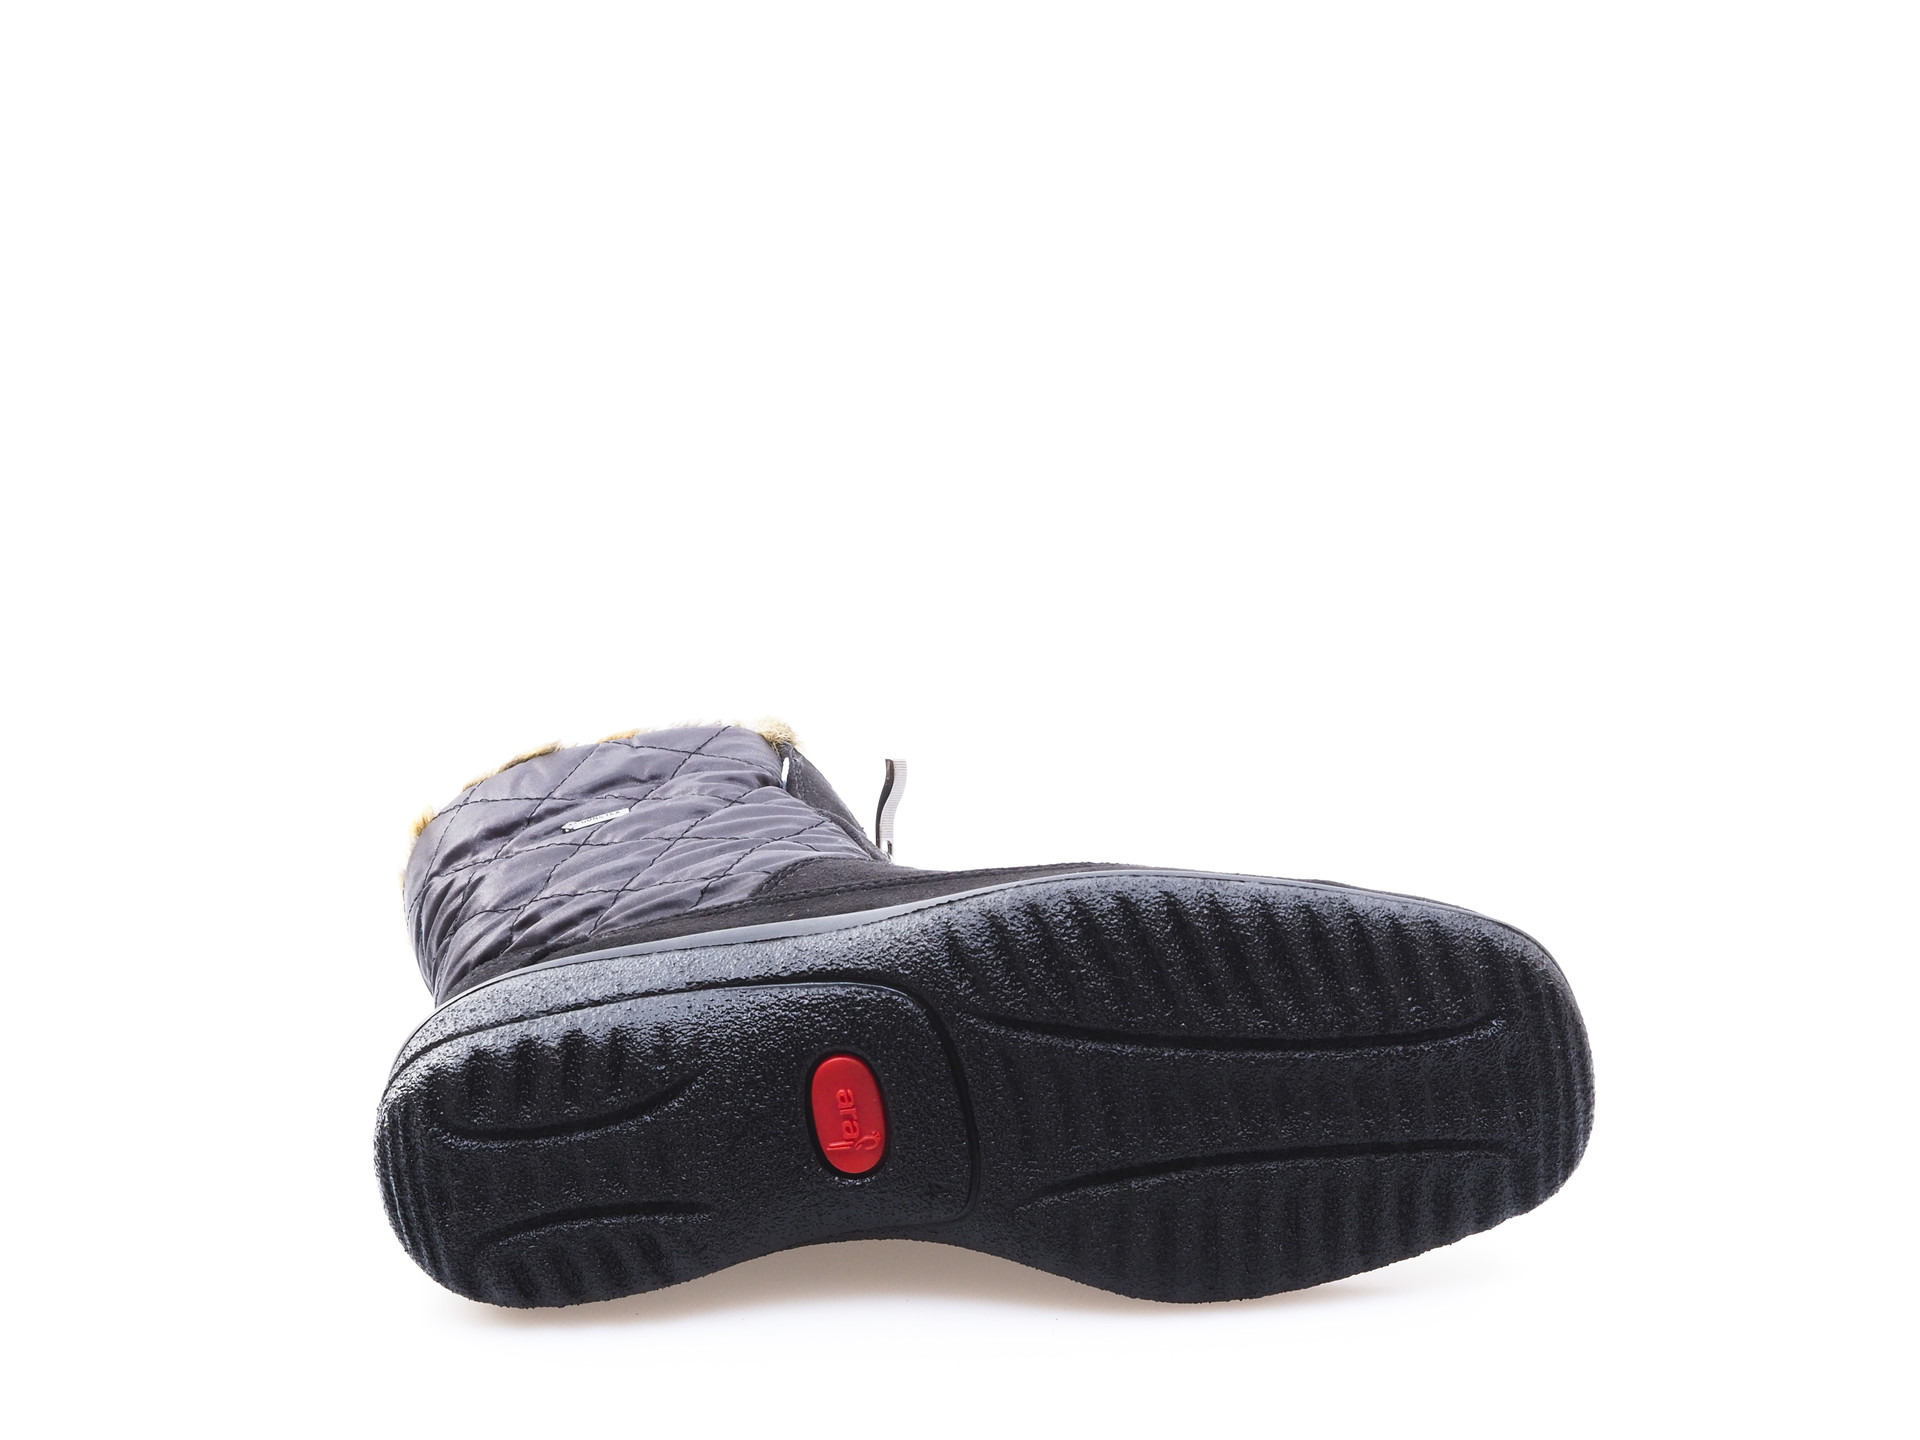 Čierne čižmy Ara s membránou GORE-TEX 84da94ab0a